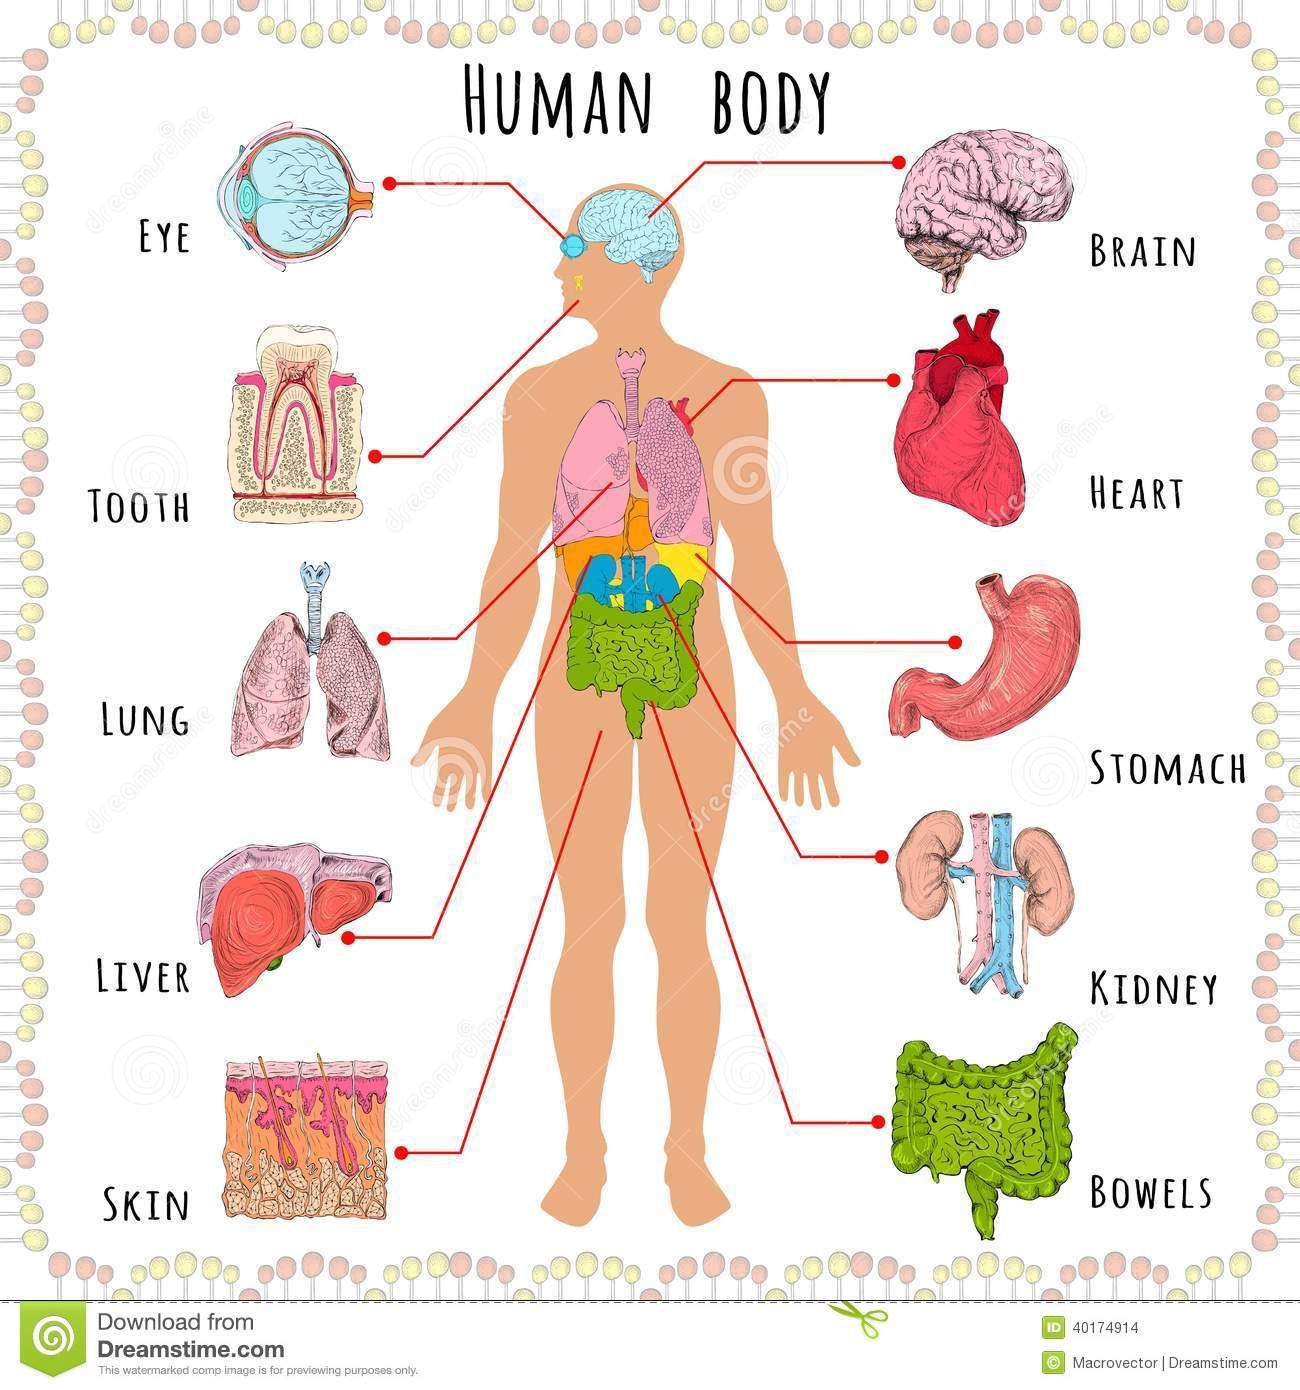 Human body organs clipart.